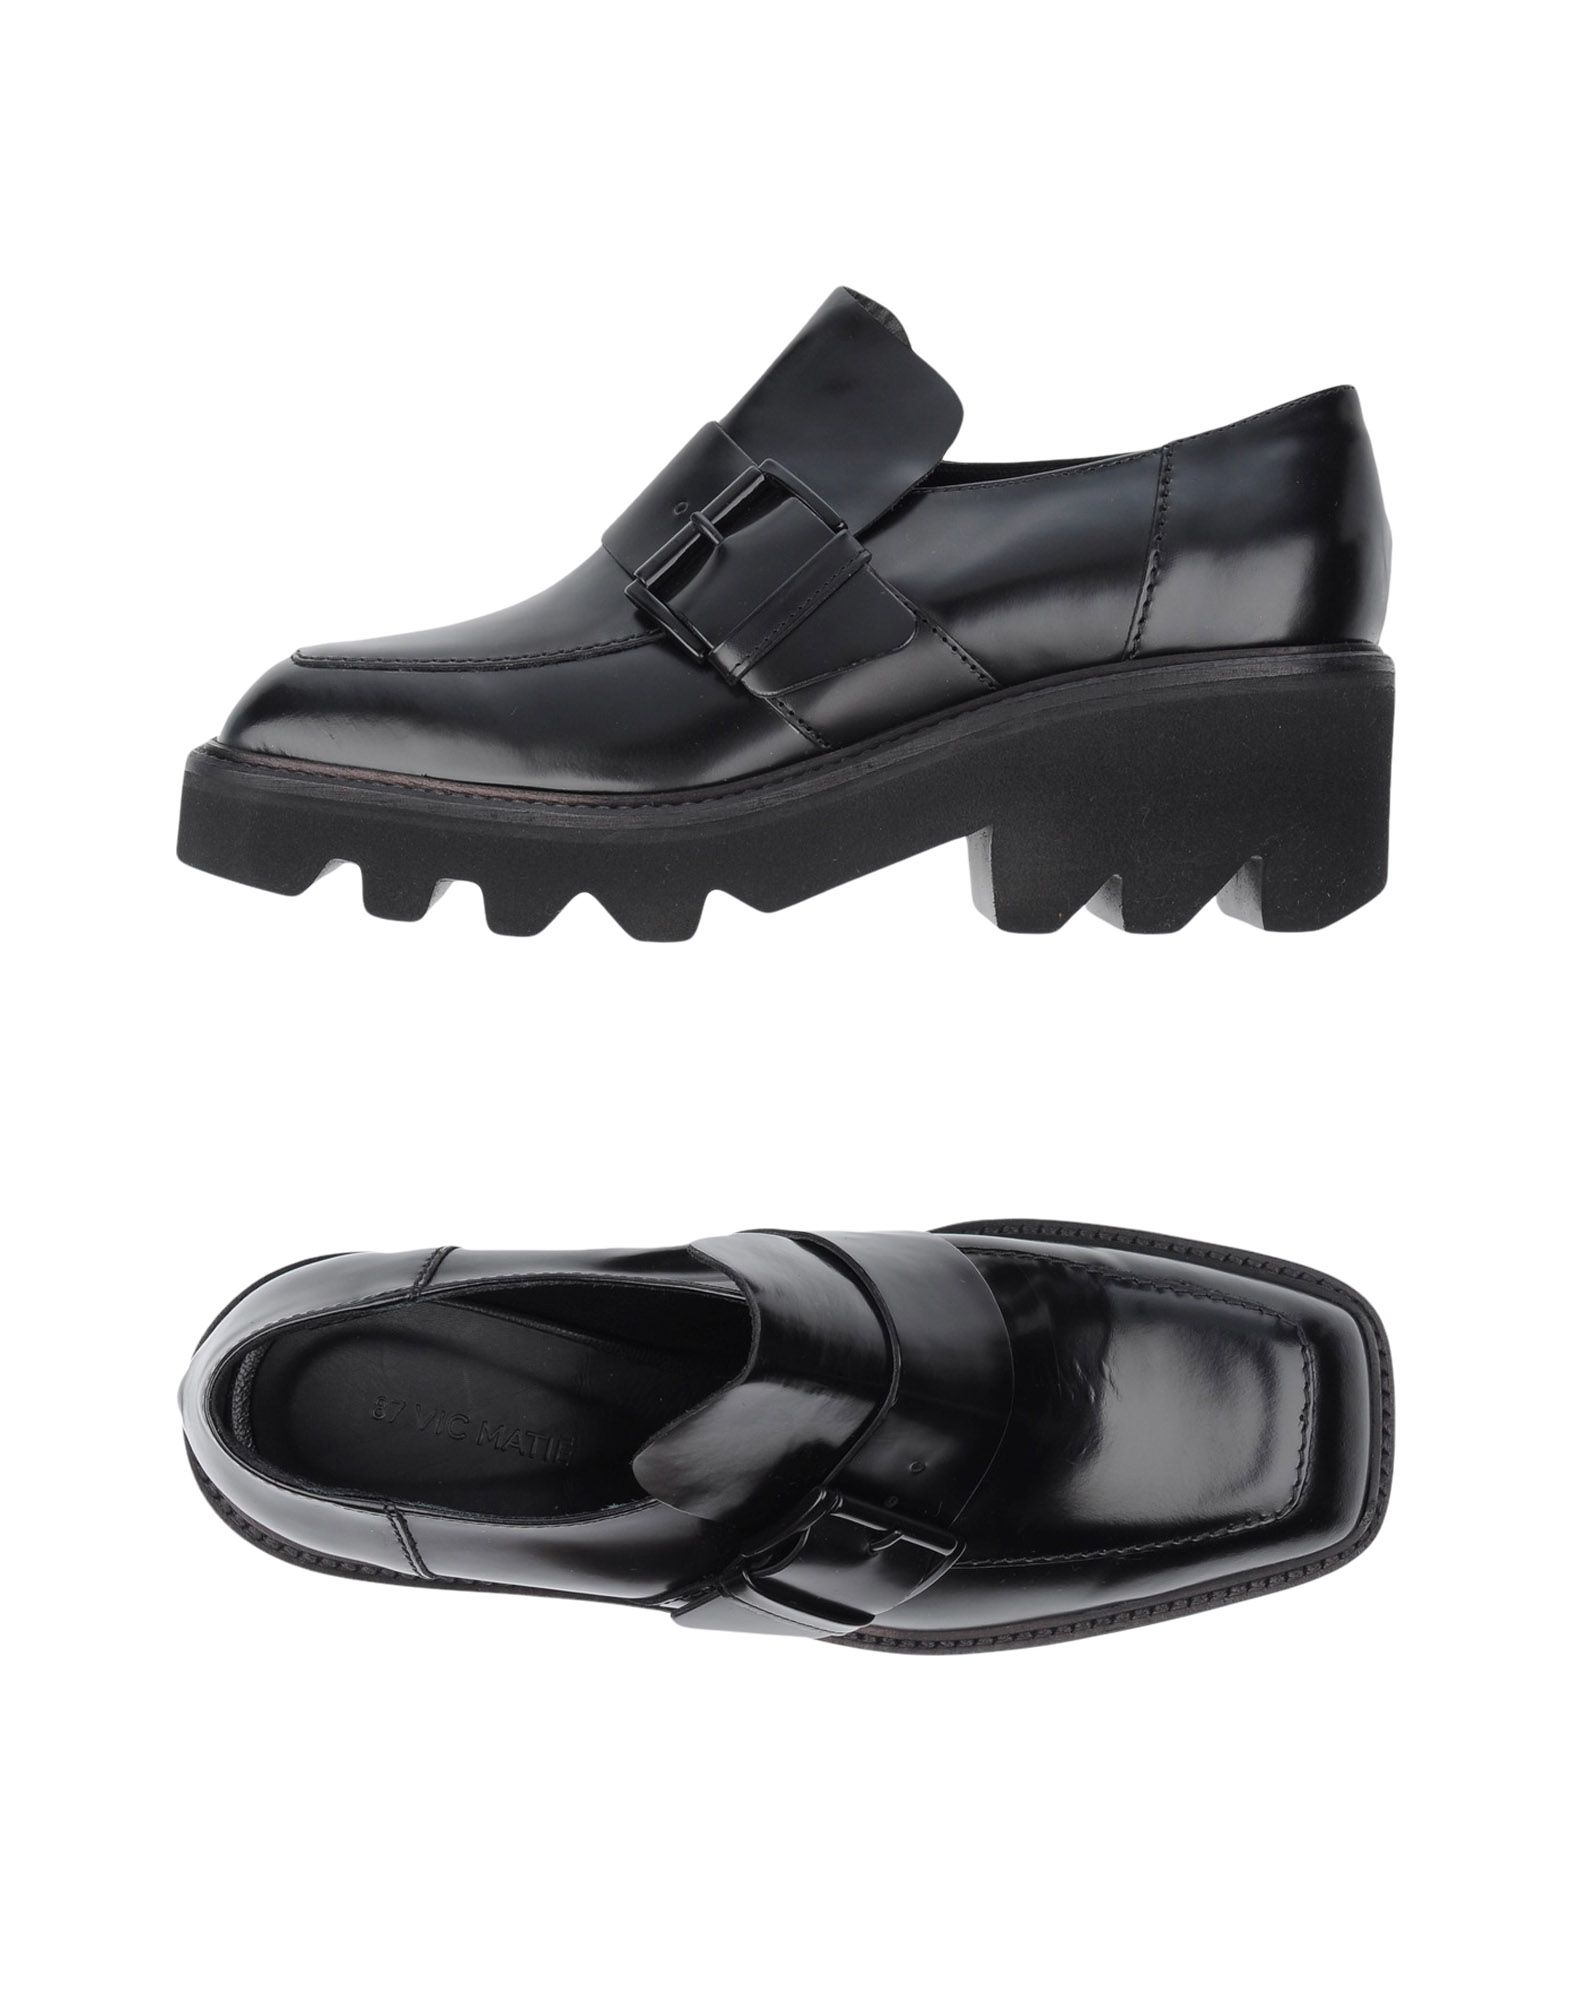 Mocassino 87 Donna 11277587DE Vic Matiē nsqgzy7866 scarpe